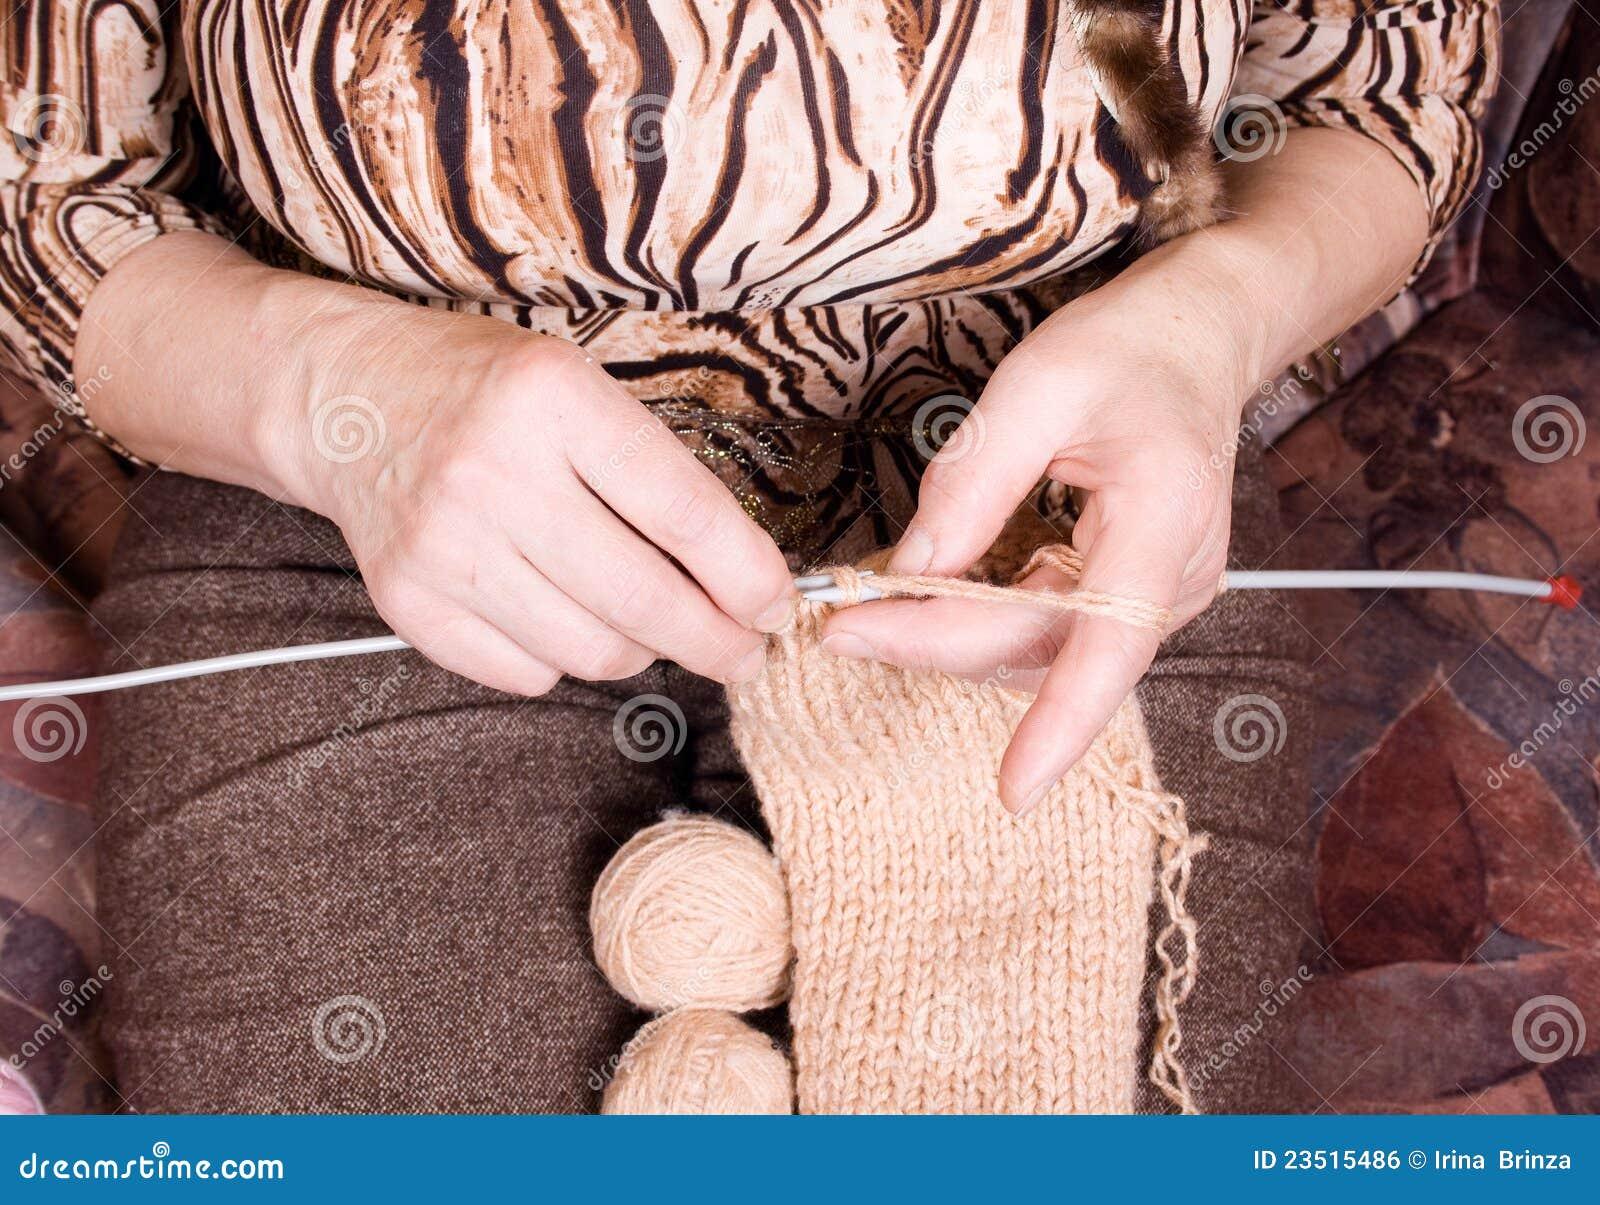 Old Knitting Woman : Old woman knitting royalty free stock image